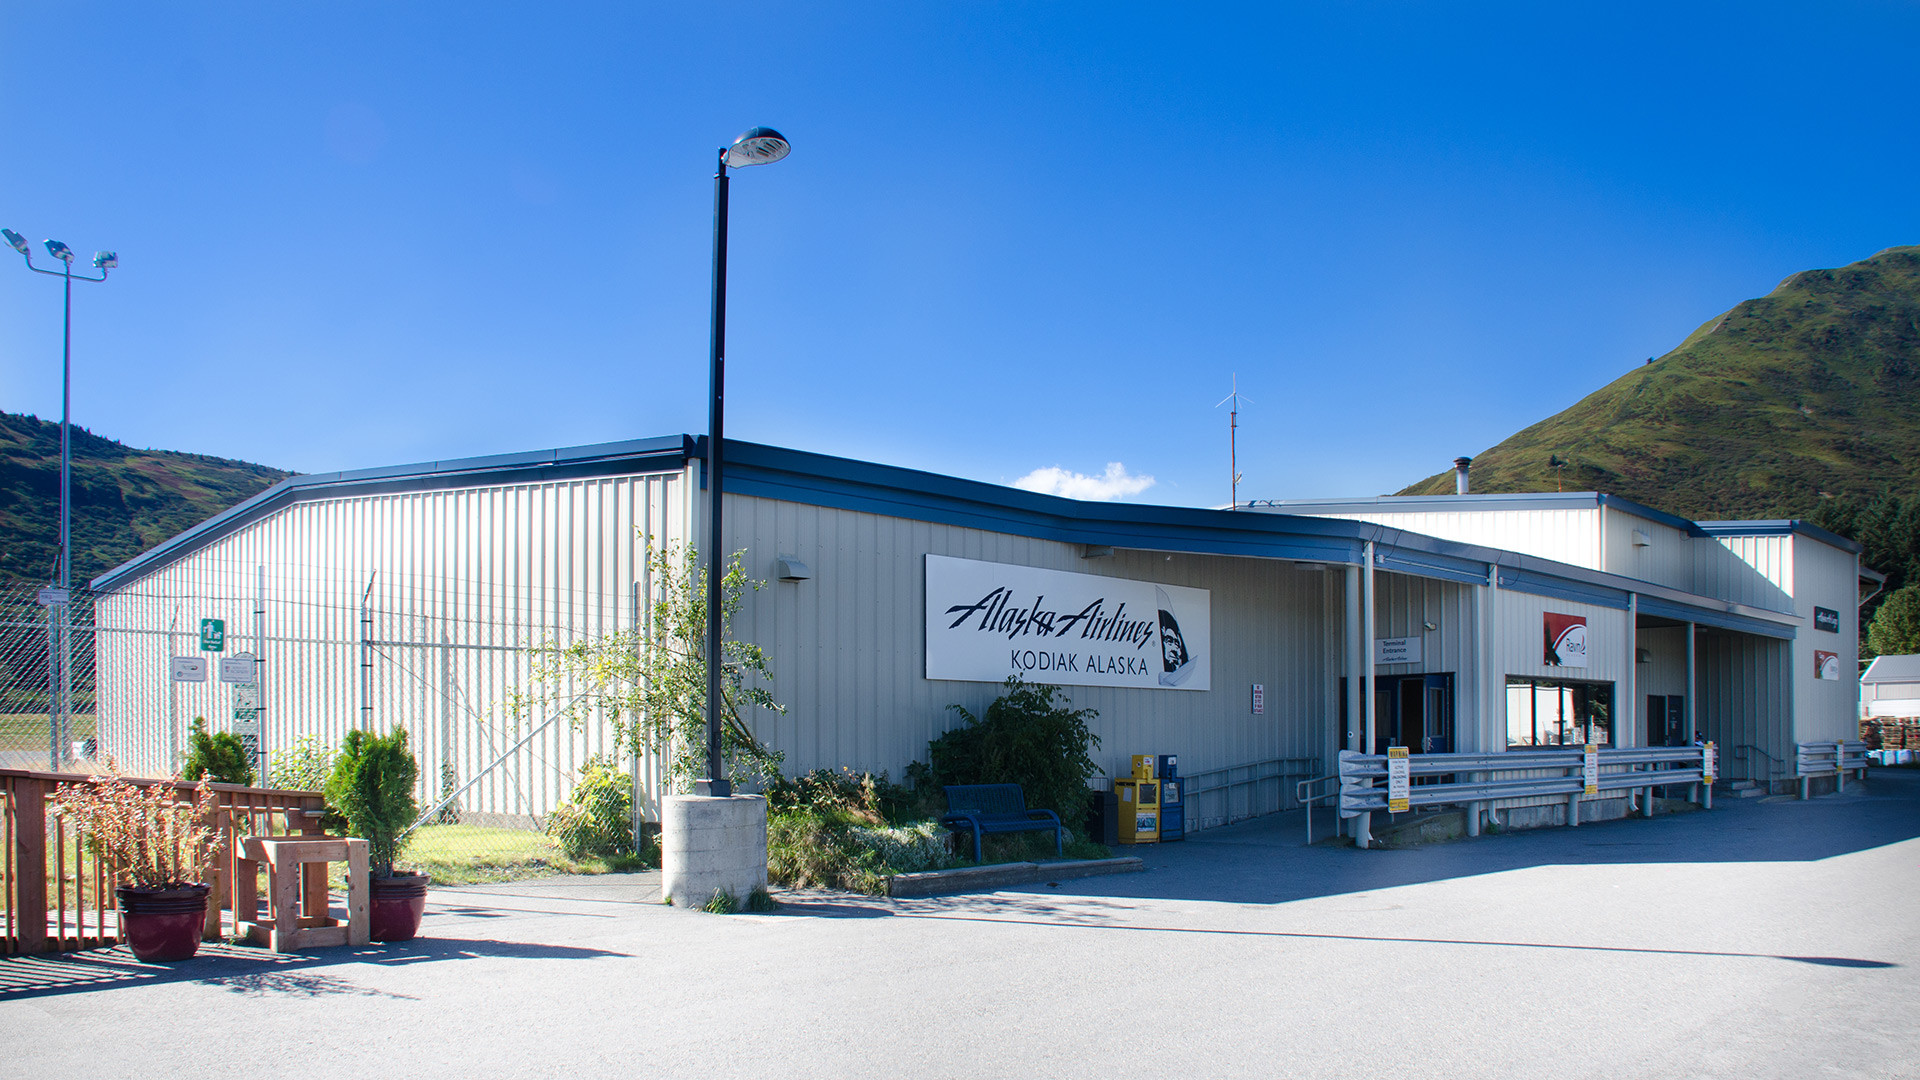 Alaska Airlines Kodiak Airport Upgrades Cornerstone